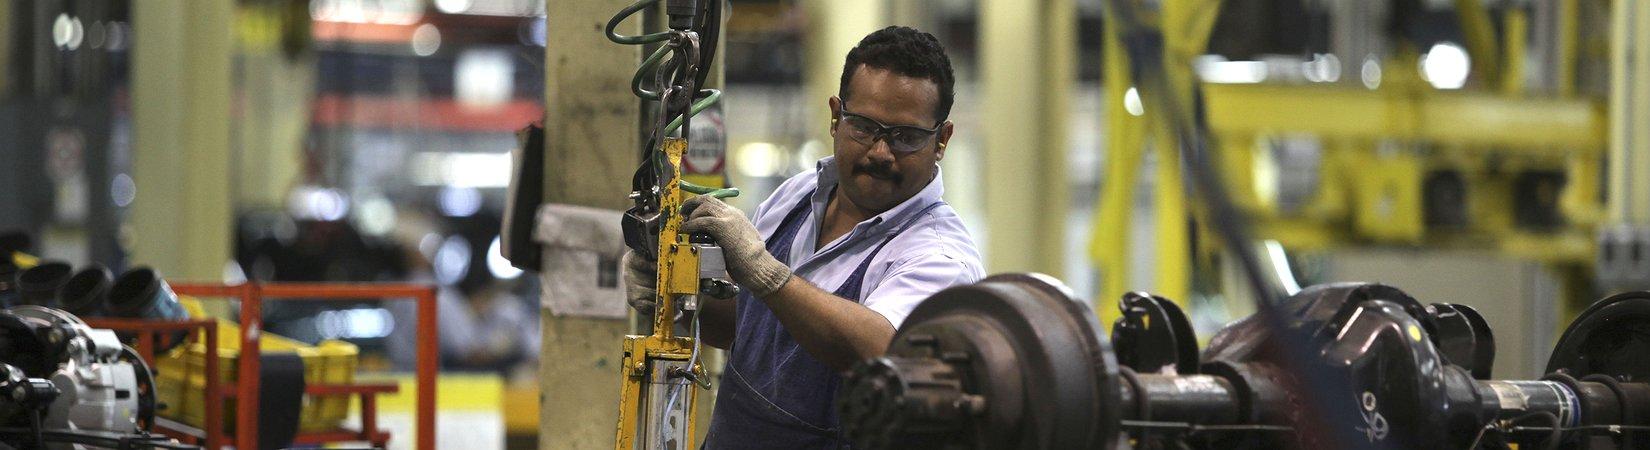 GM accuses Venezuela of illegally seizing its auto plant